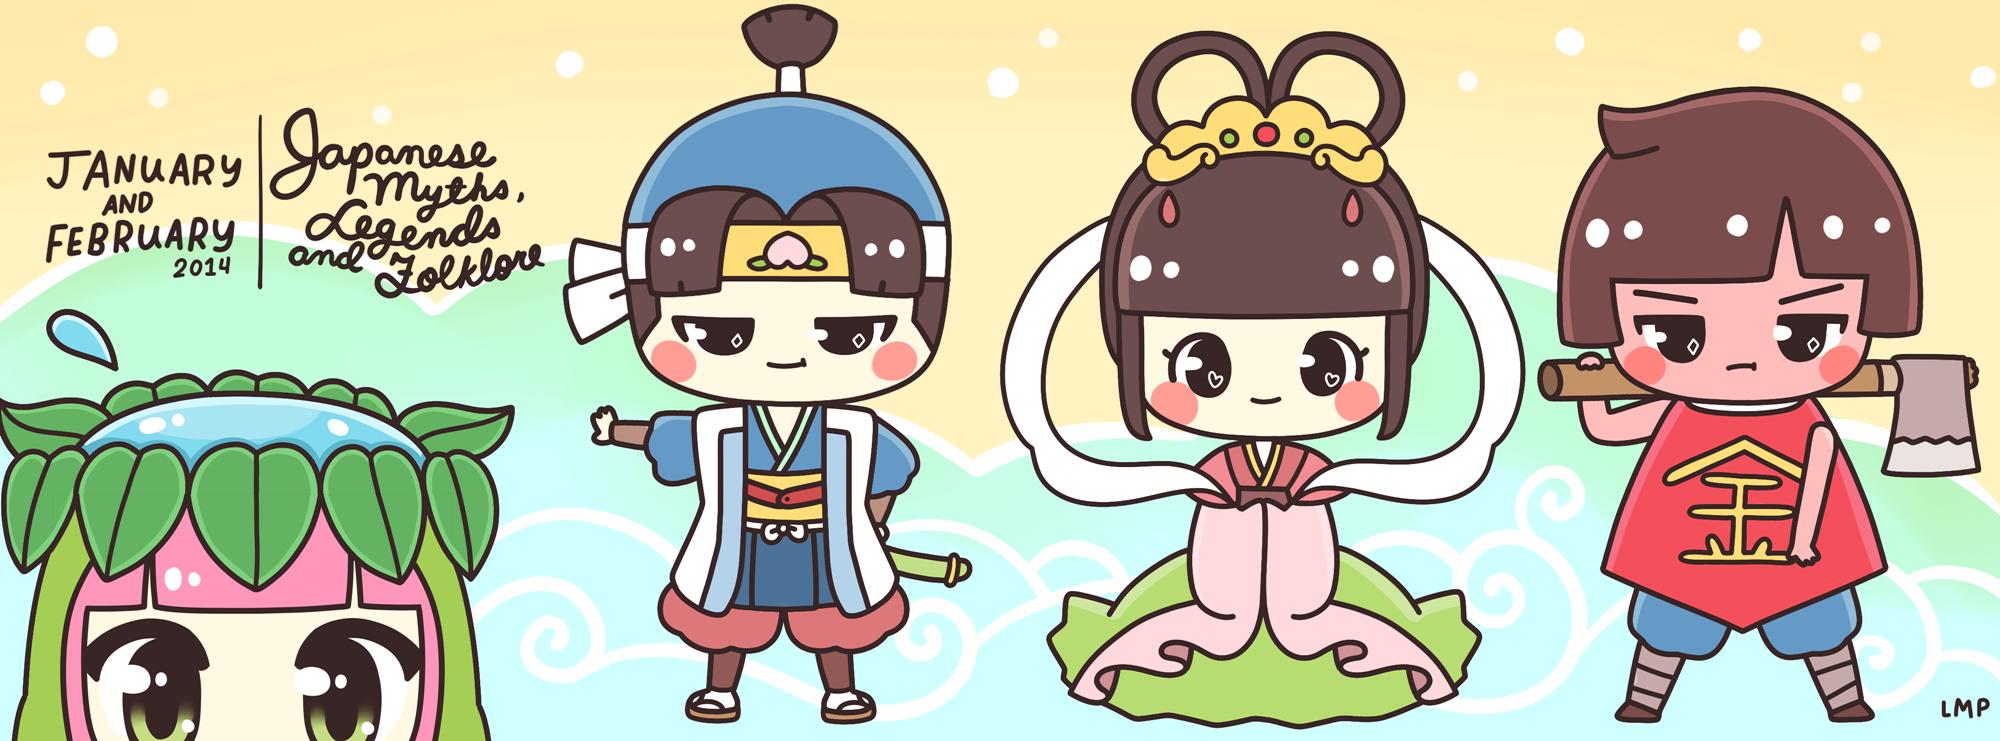 Mythology clipart myth legend Folklore! Japanese Legends Lover Japanese